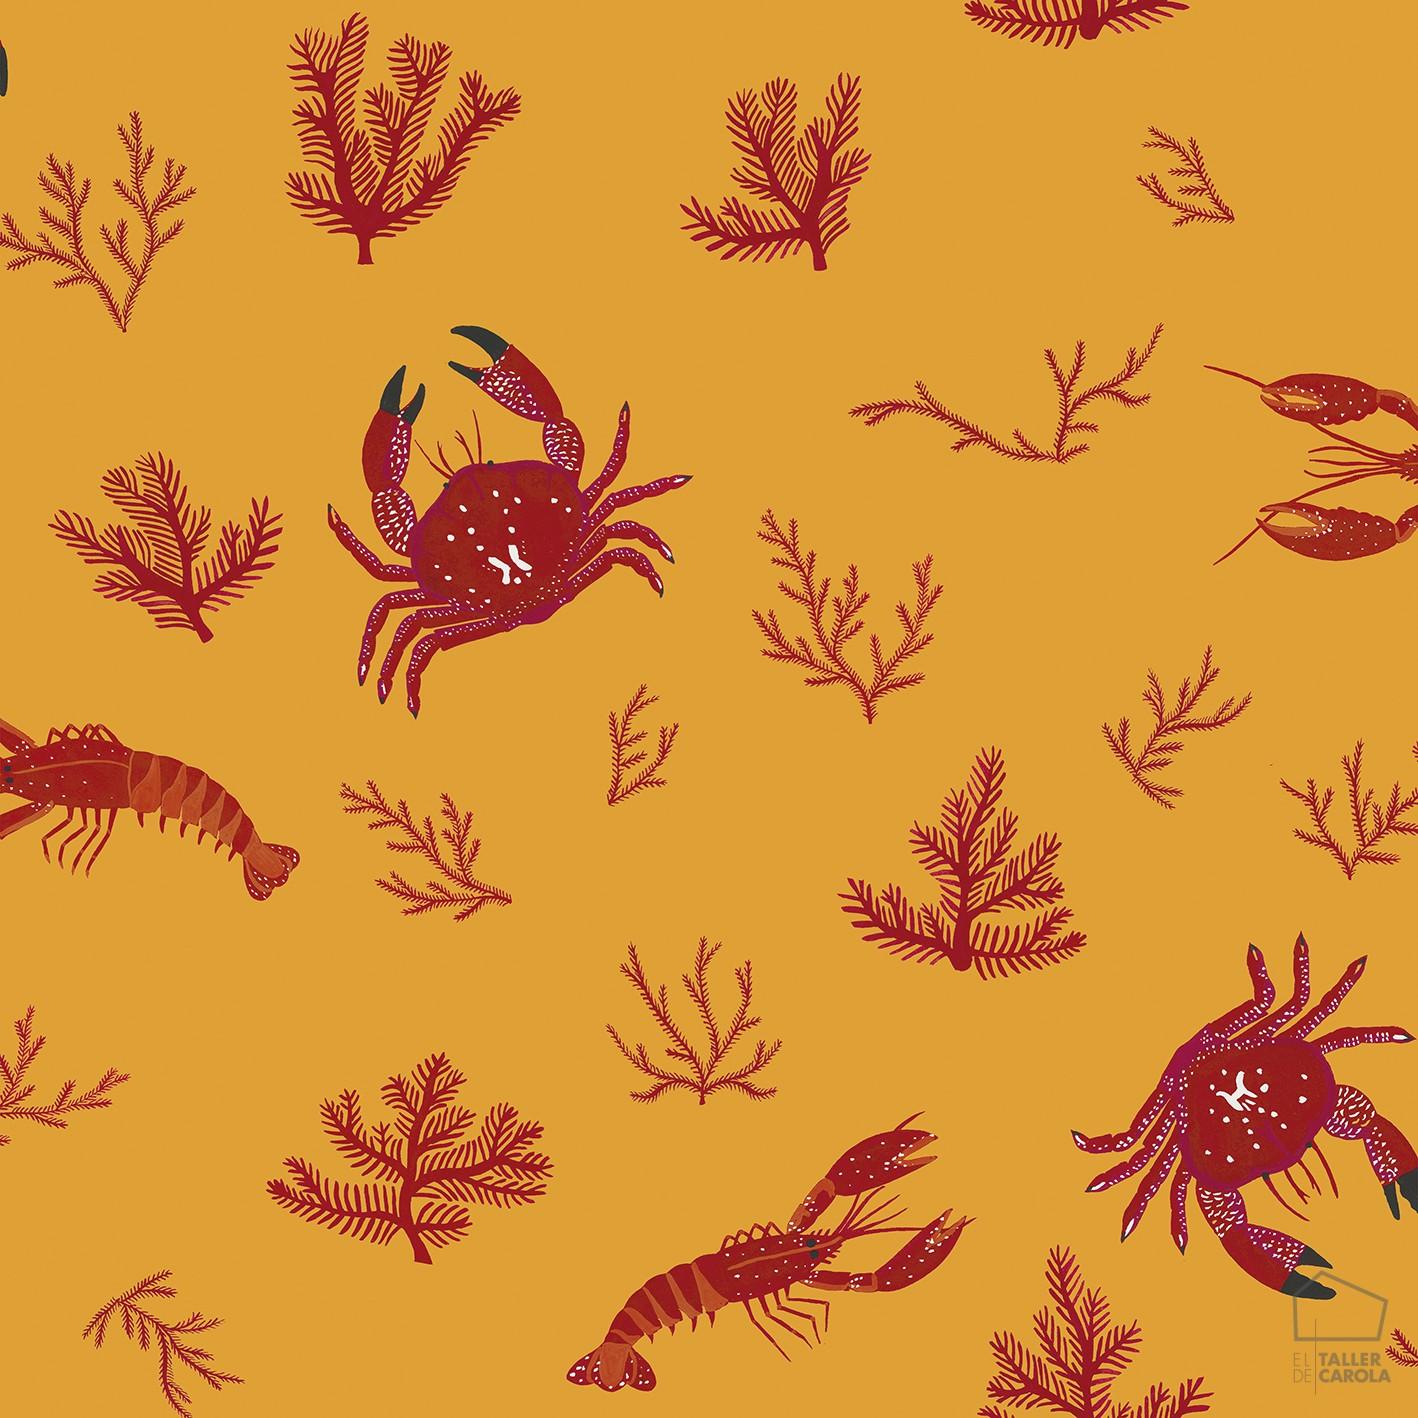 Papel pintado cru cangrejos naranja el taller de carola - Papel pintado animales ...